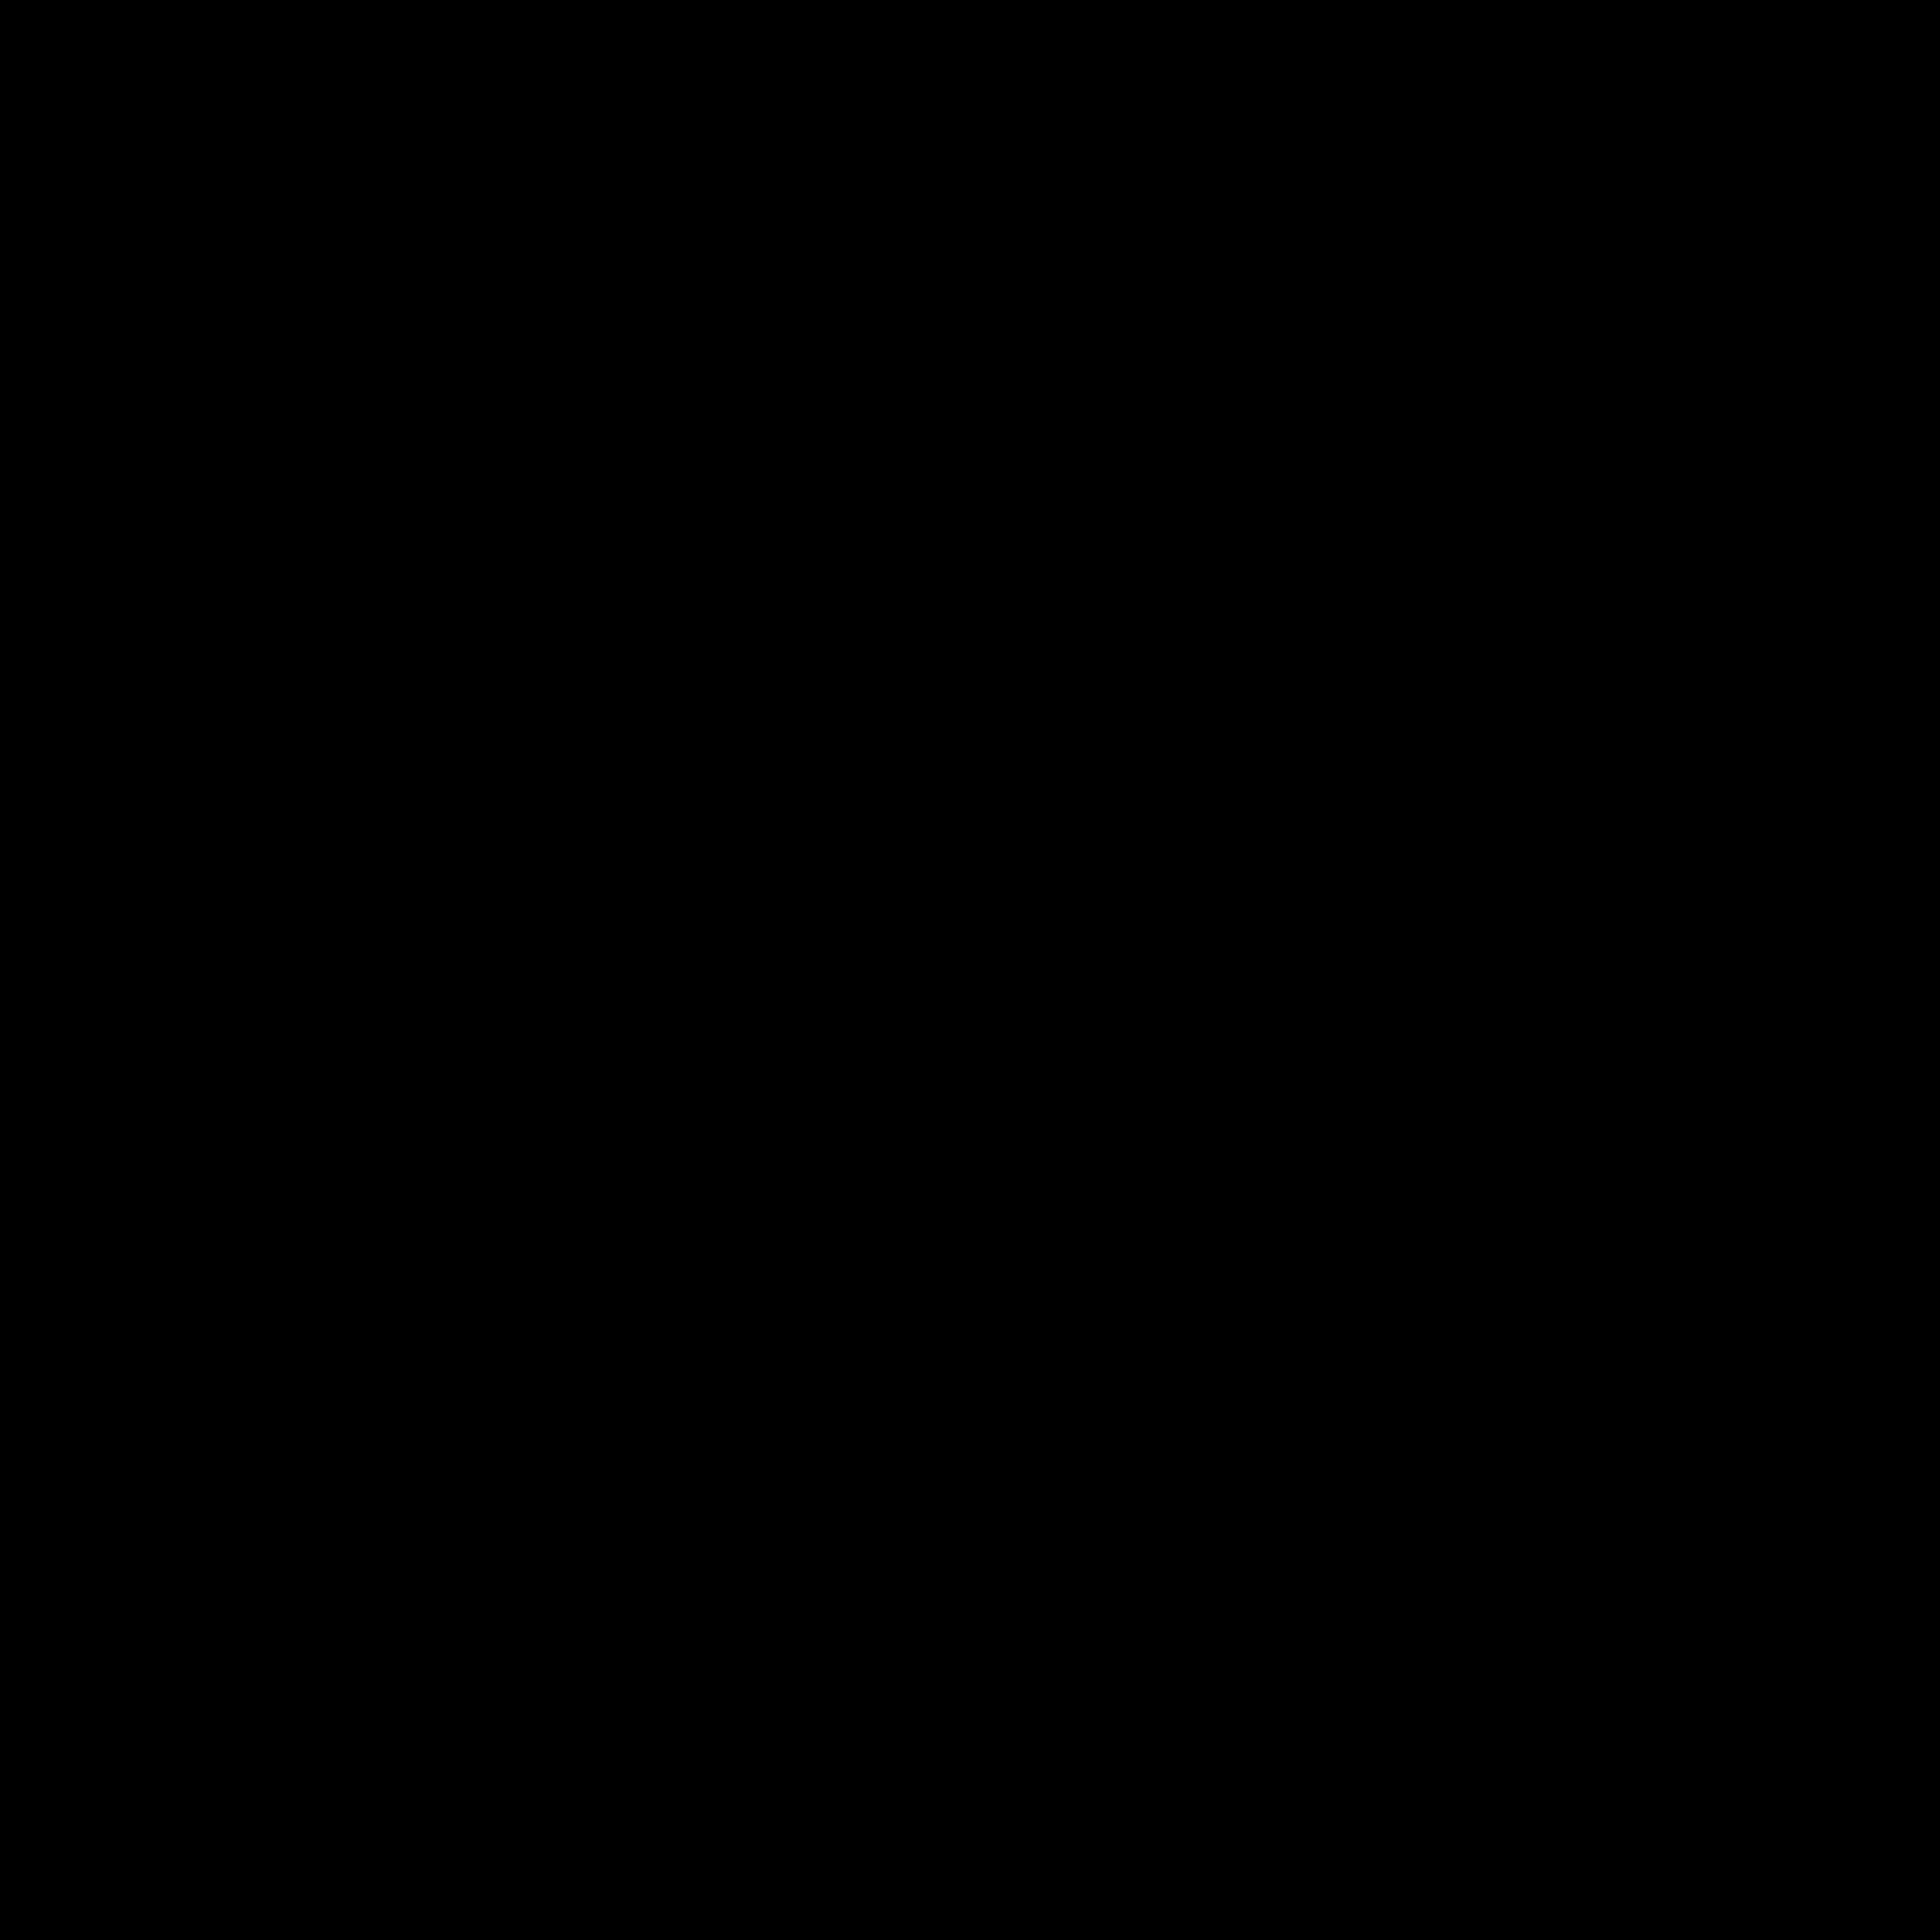 rss, black icon